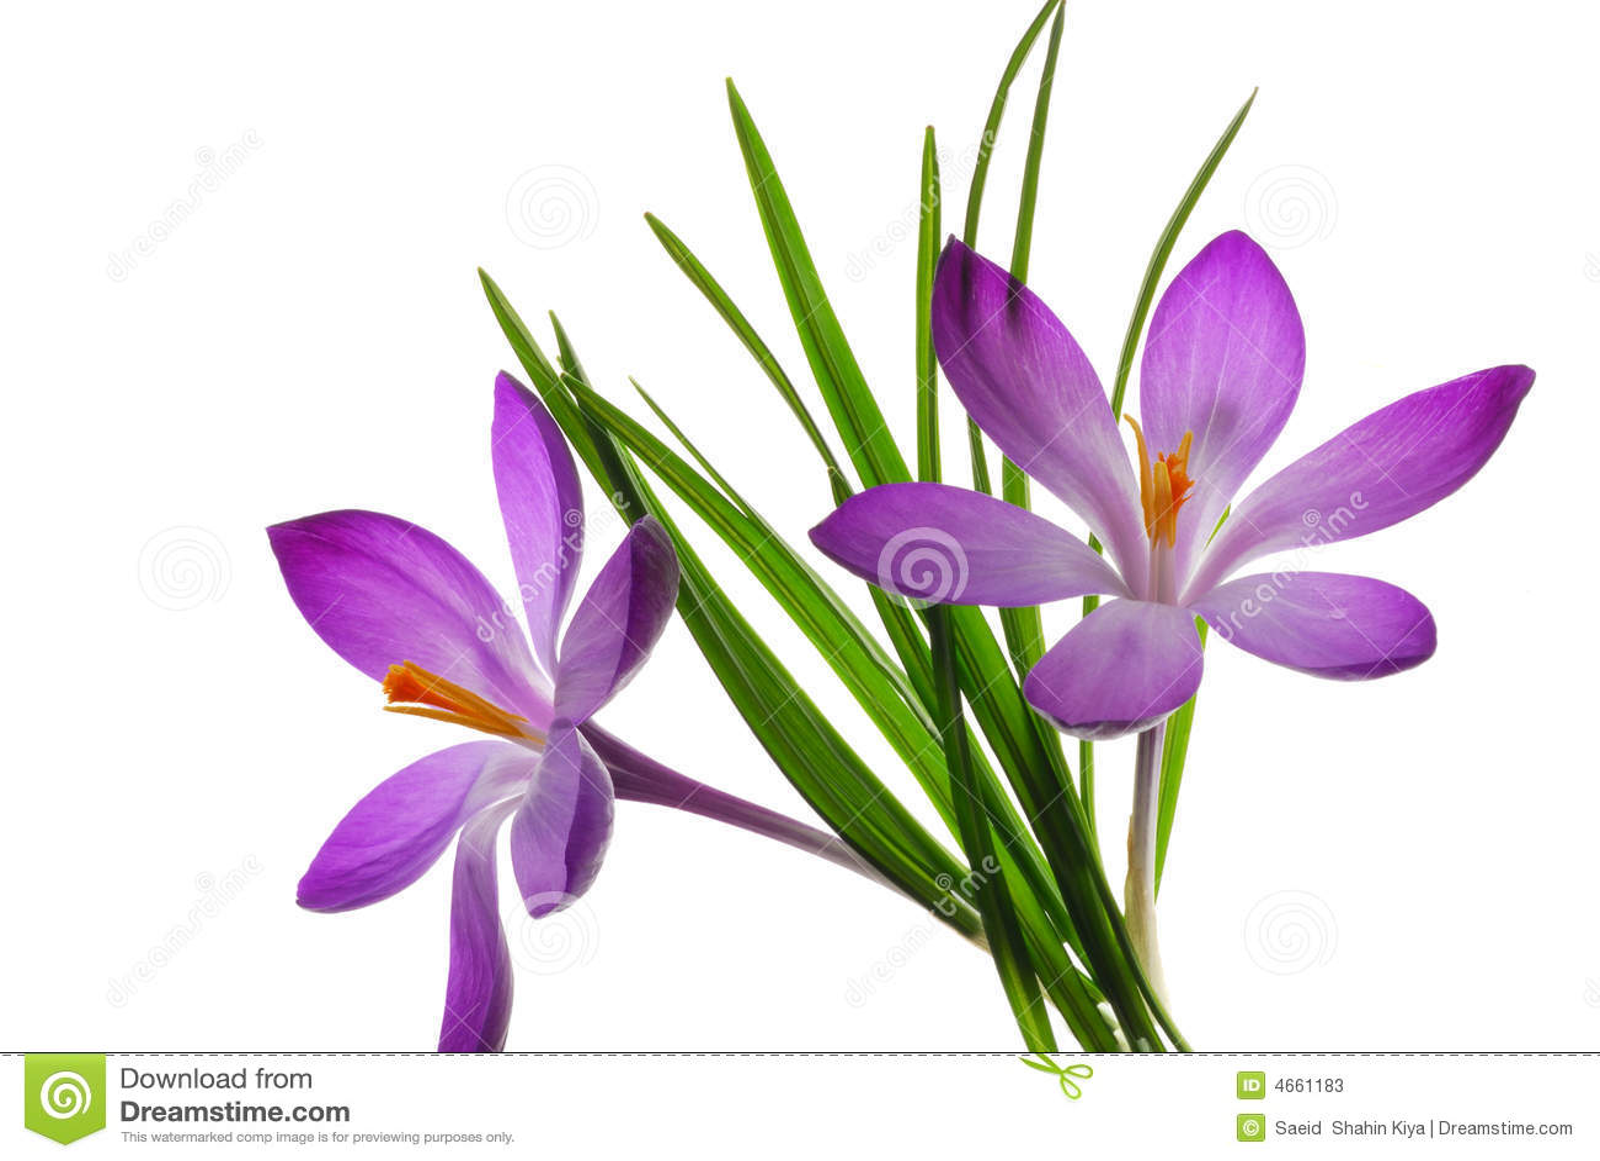 Purple flowers and leaves